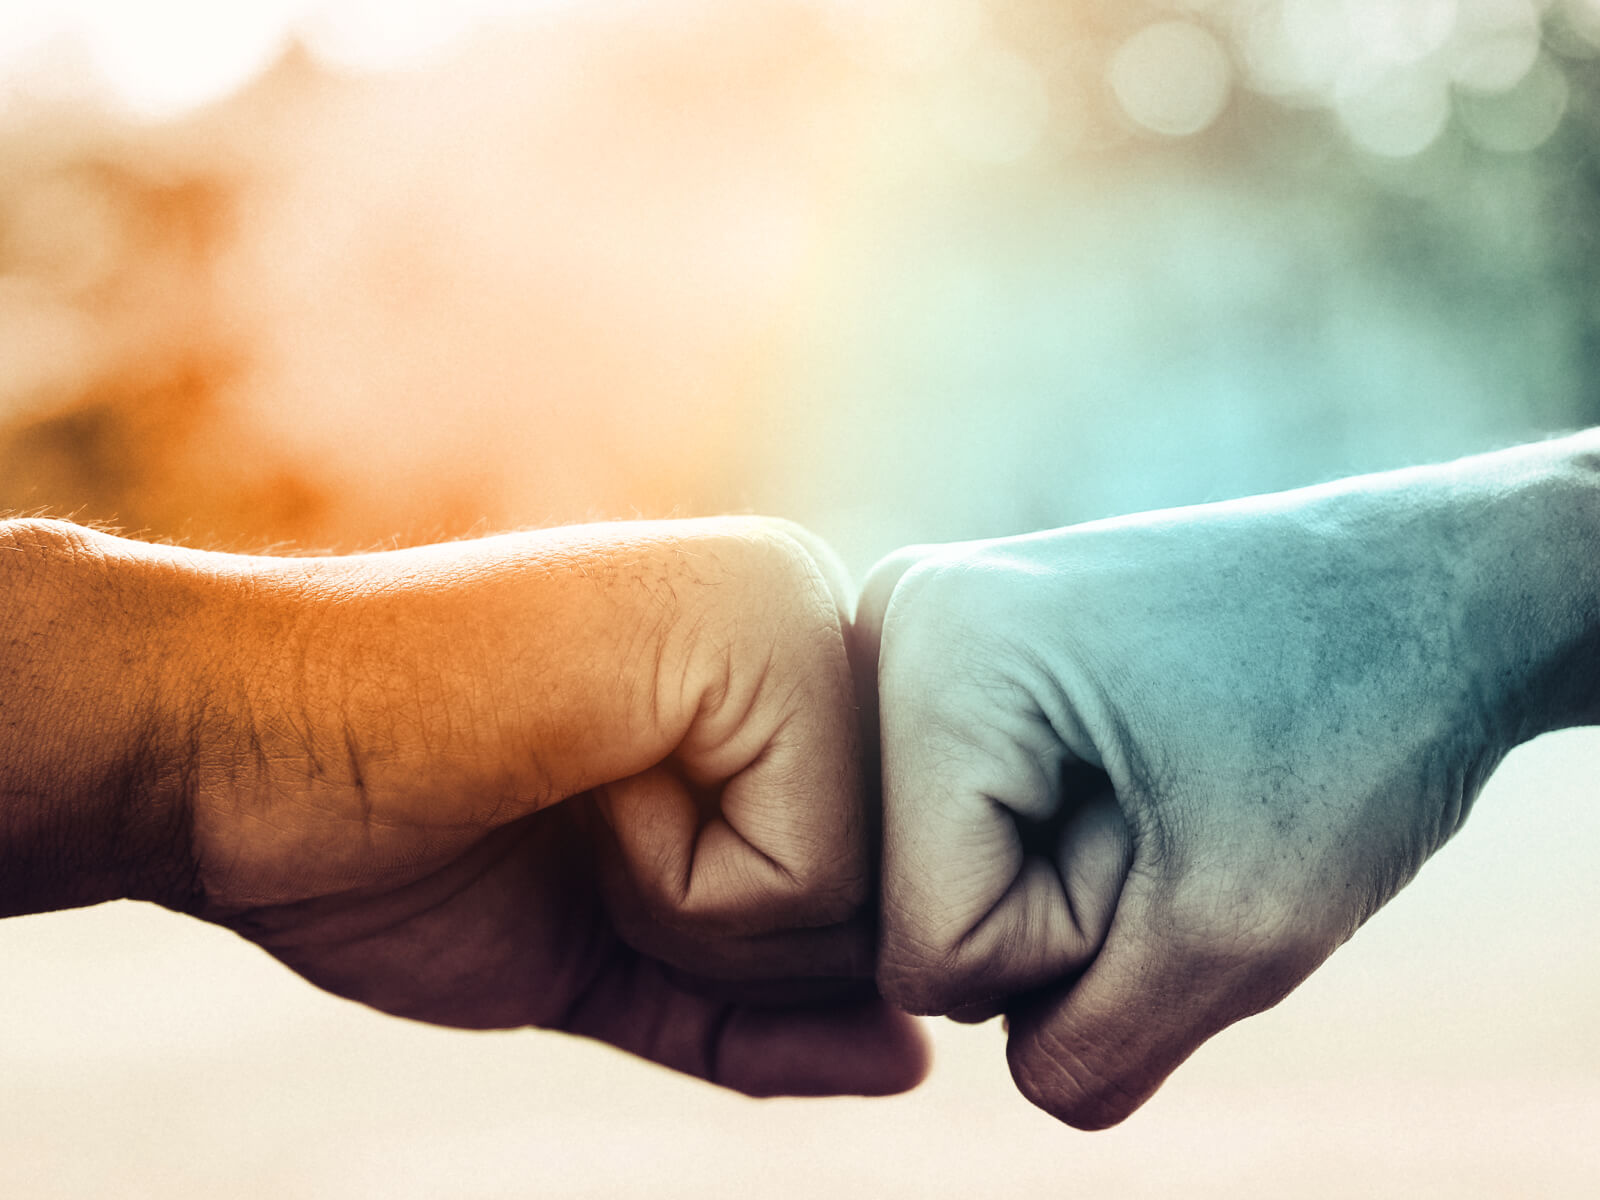 Building trust through decentralization